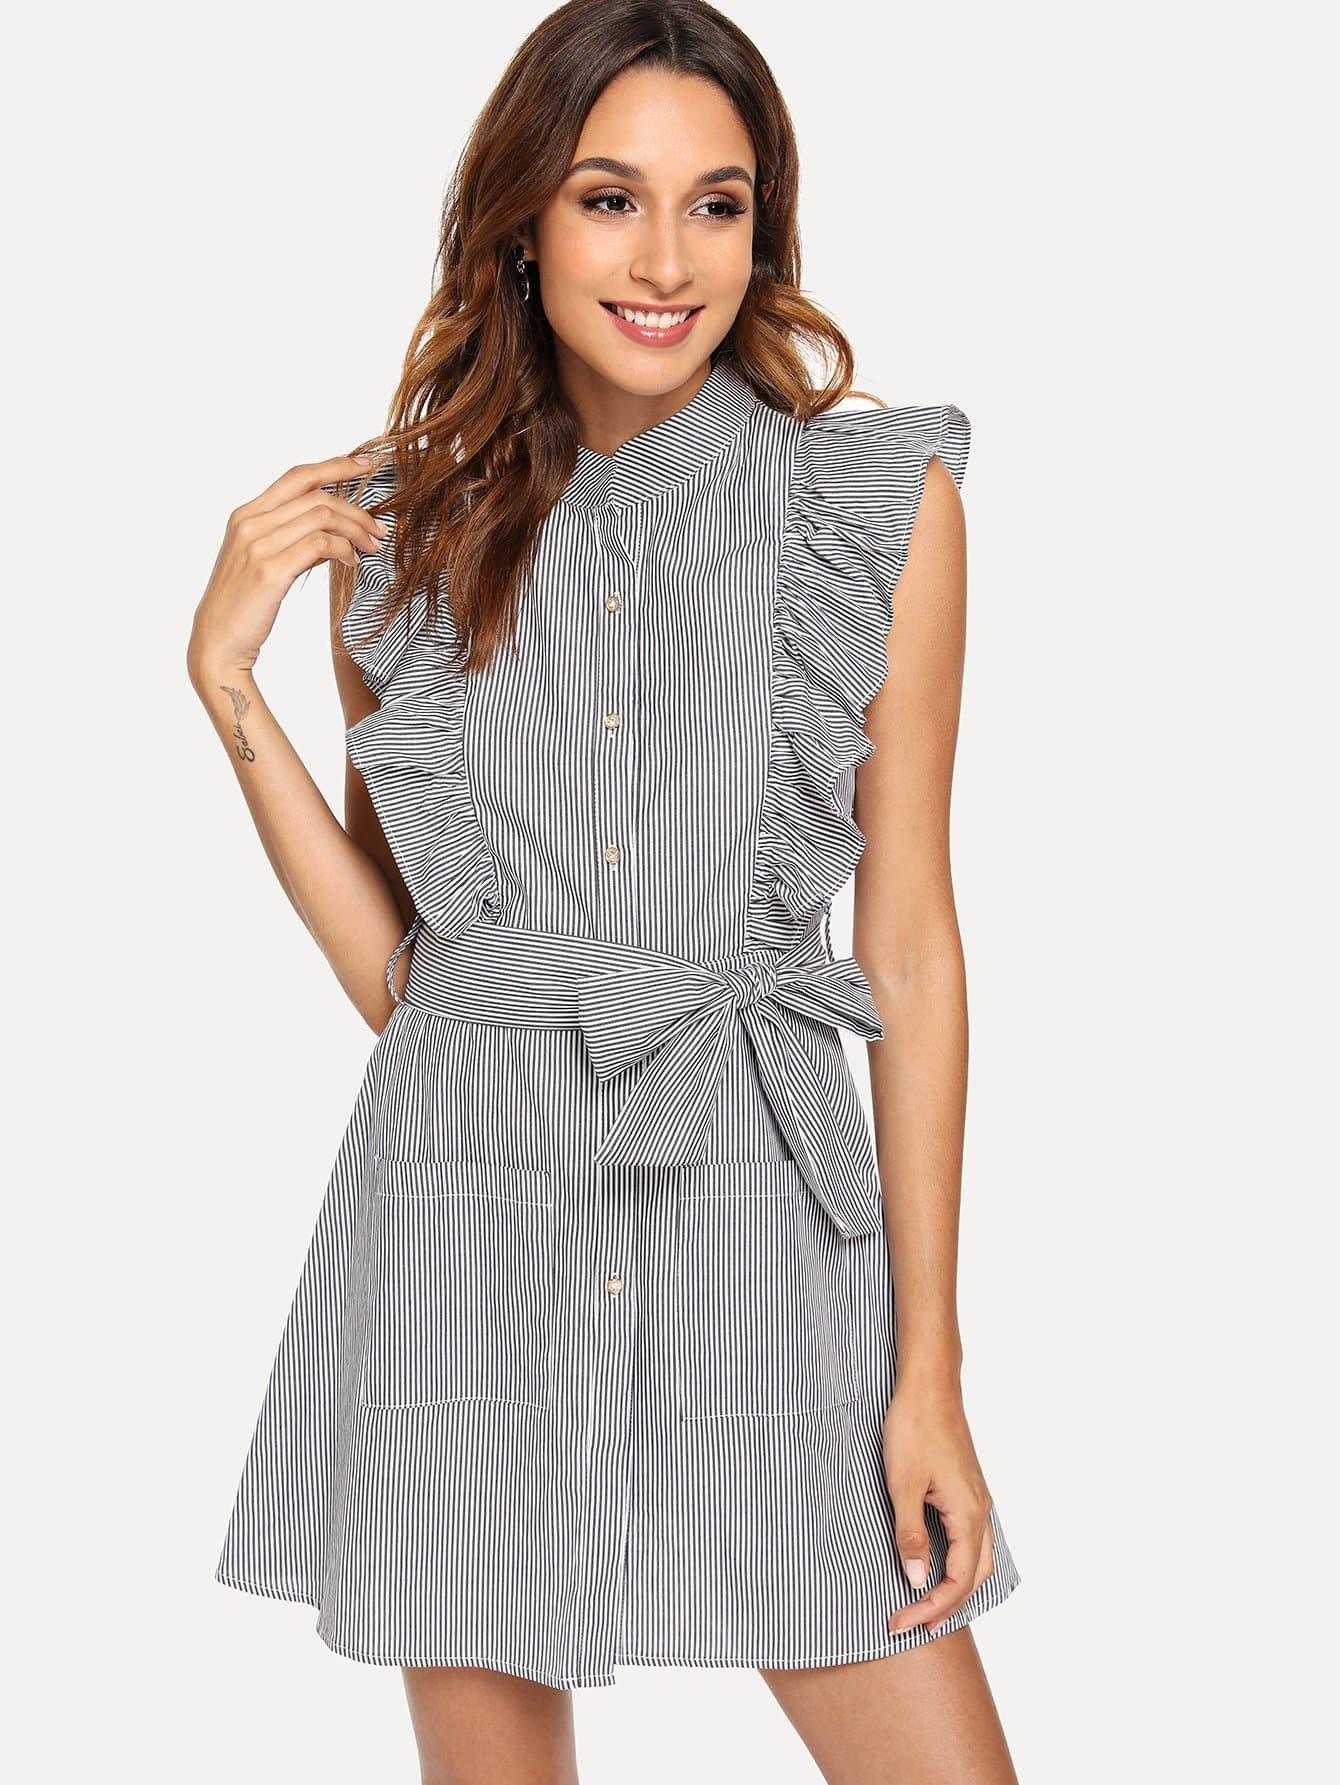 Ruffle Trim Belted Shirt Dress self belted solid ruffle trim dress